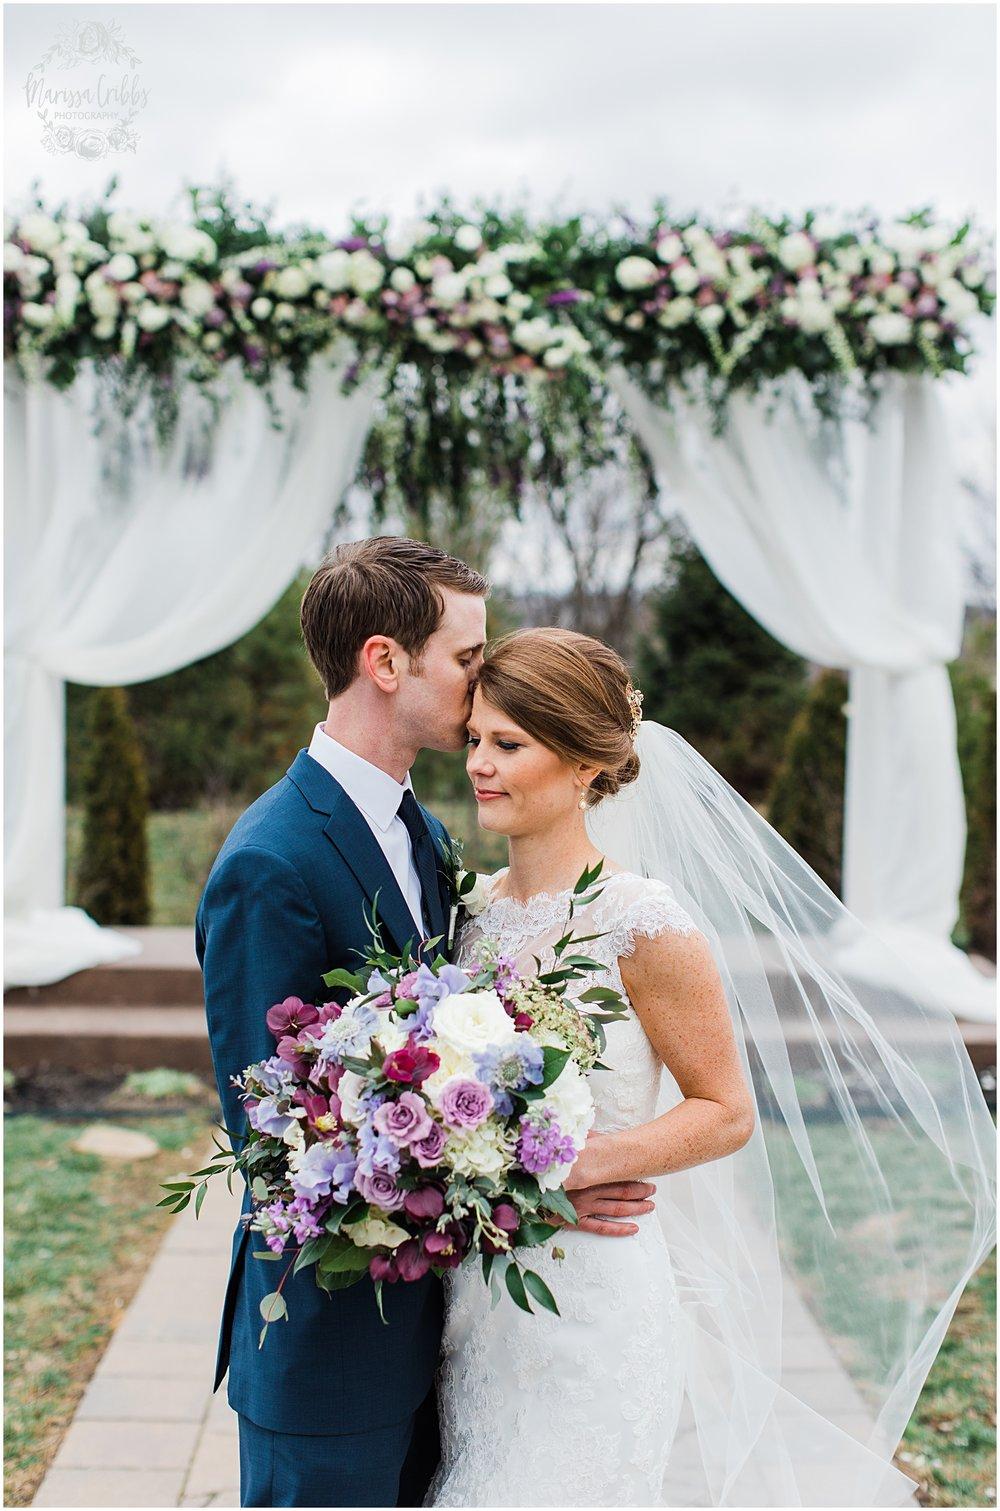 JACOBI WEDDING | 1890 EVENT SPACE | MARISSA CRIBBS PHOTOGRAPHY_4292.jpg